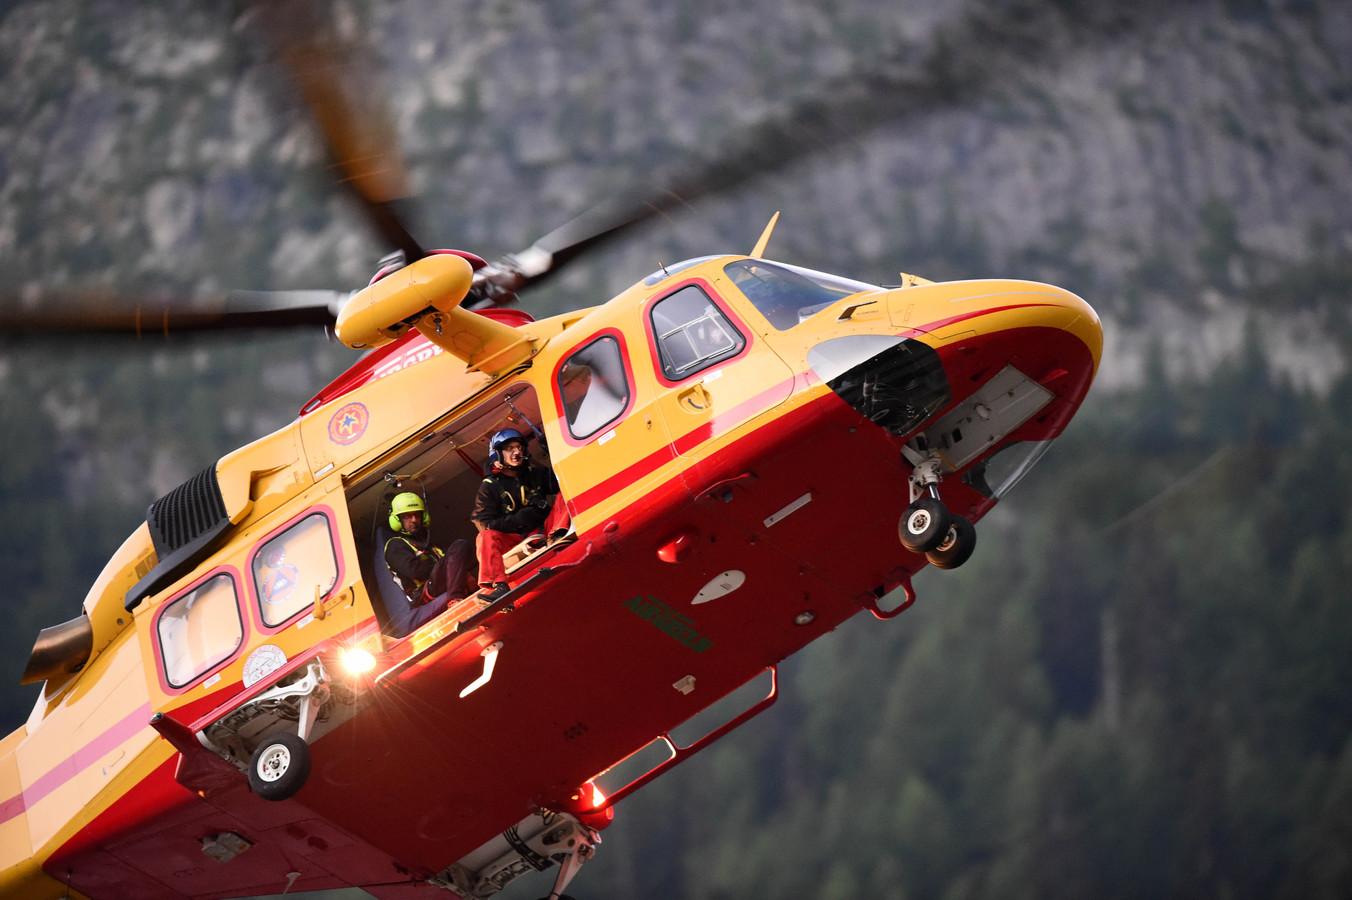 Een Italiaanse traumahelikopter (archieffoto).